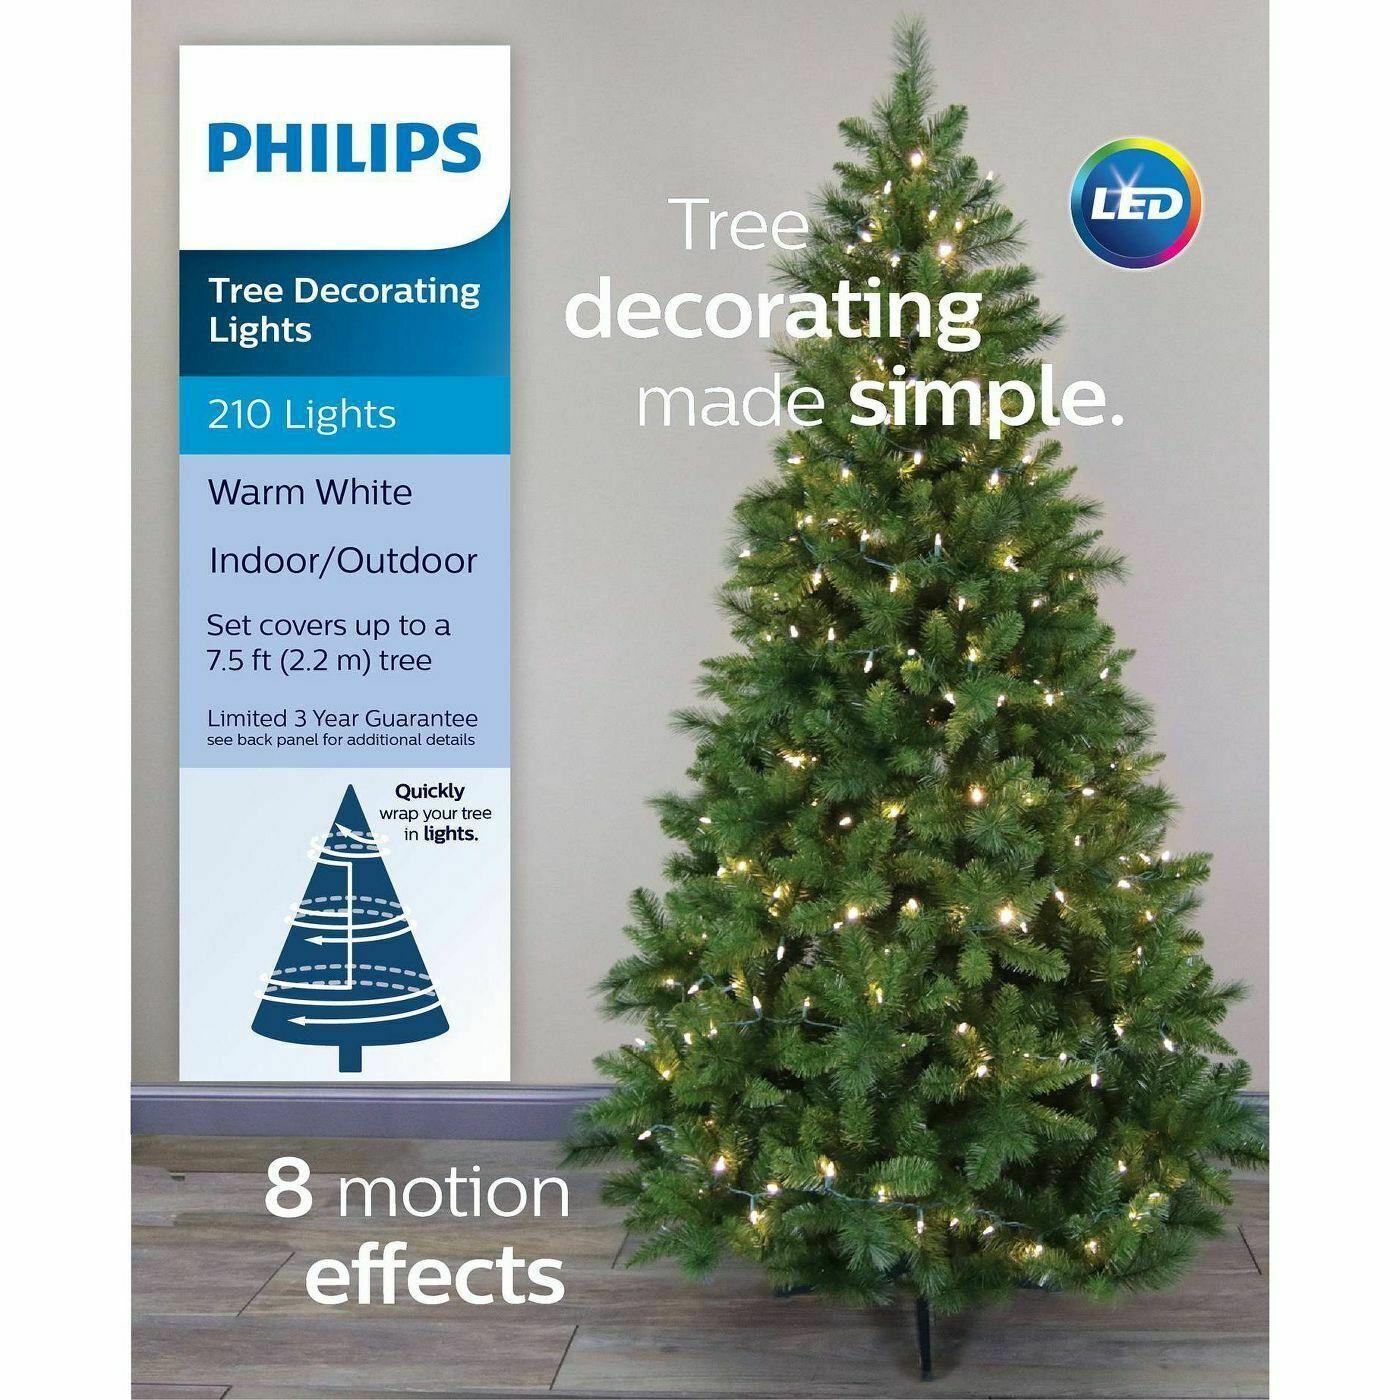 Philips Led Christmas Tree: Philips 210ct 8 Function Christmas Tree Decorating LED